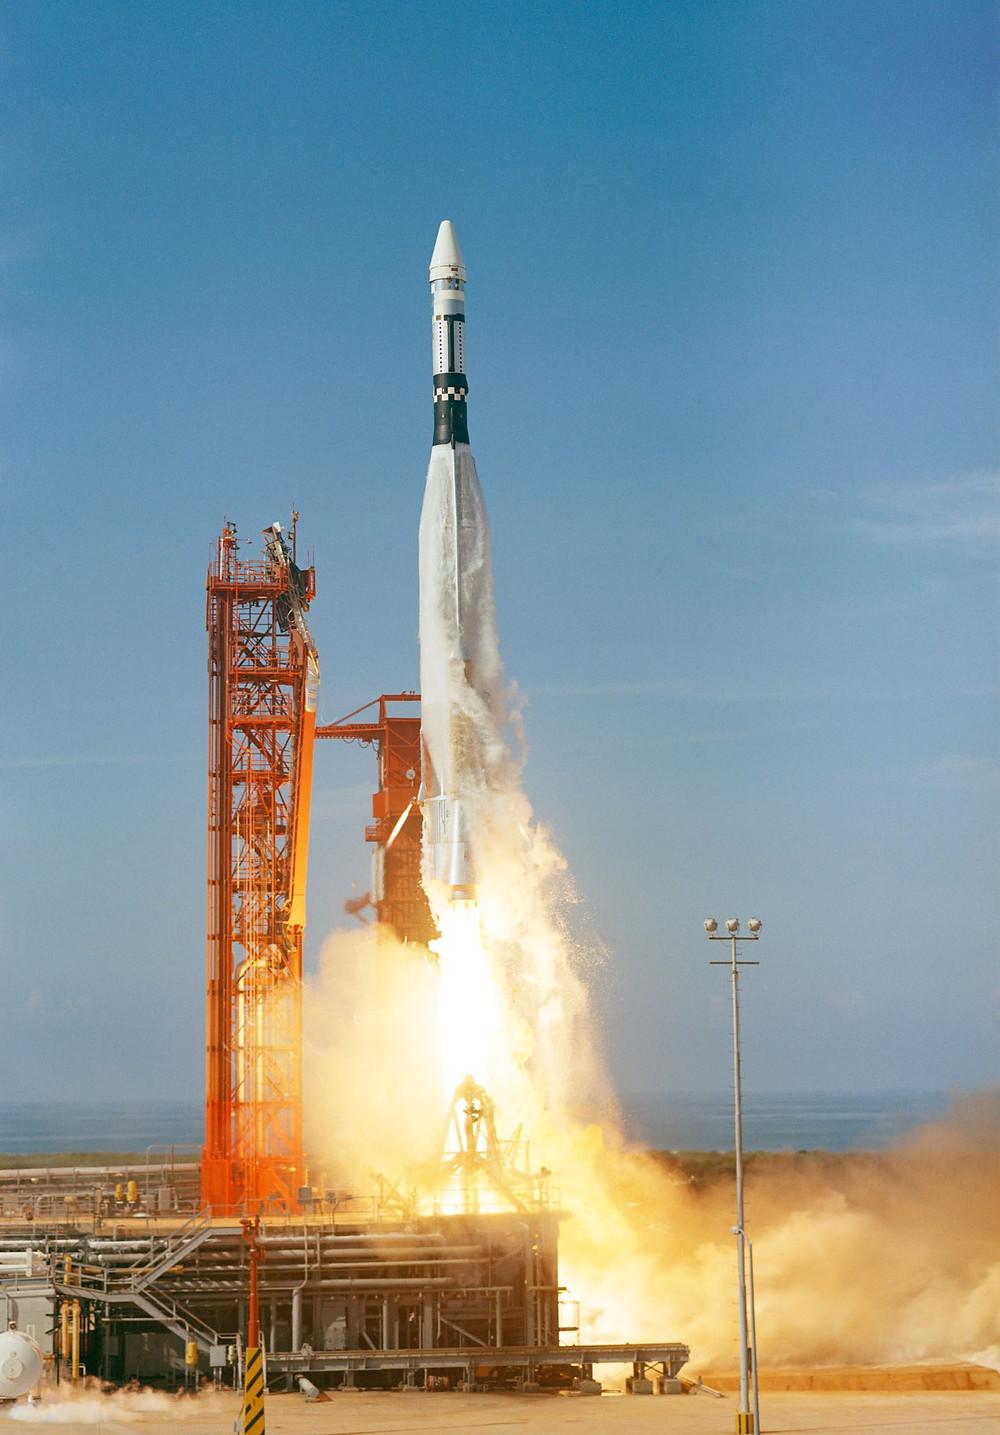 Atlas-Agena rocket launch